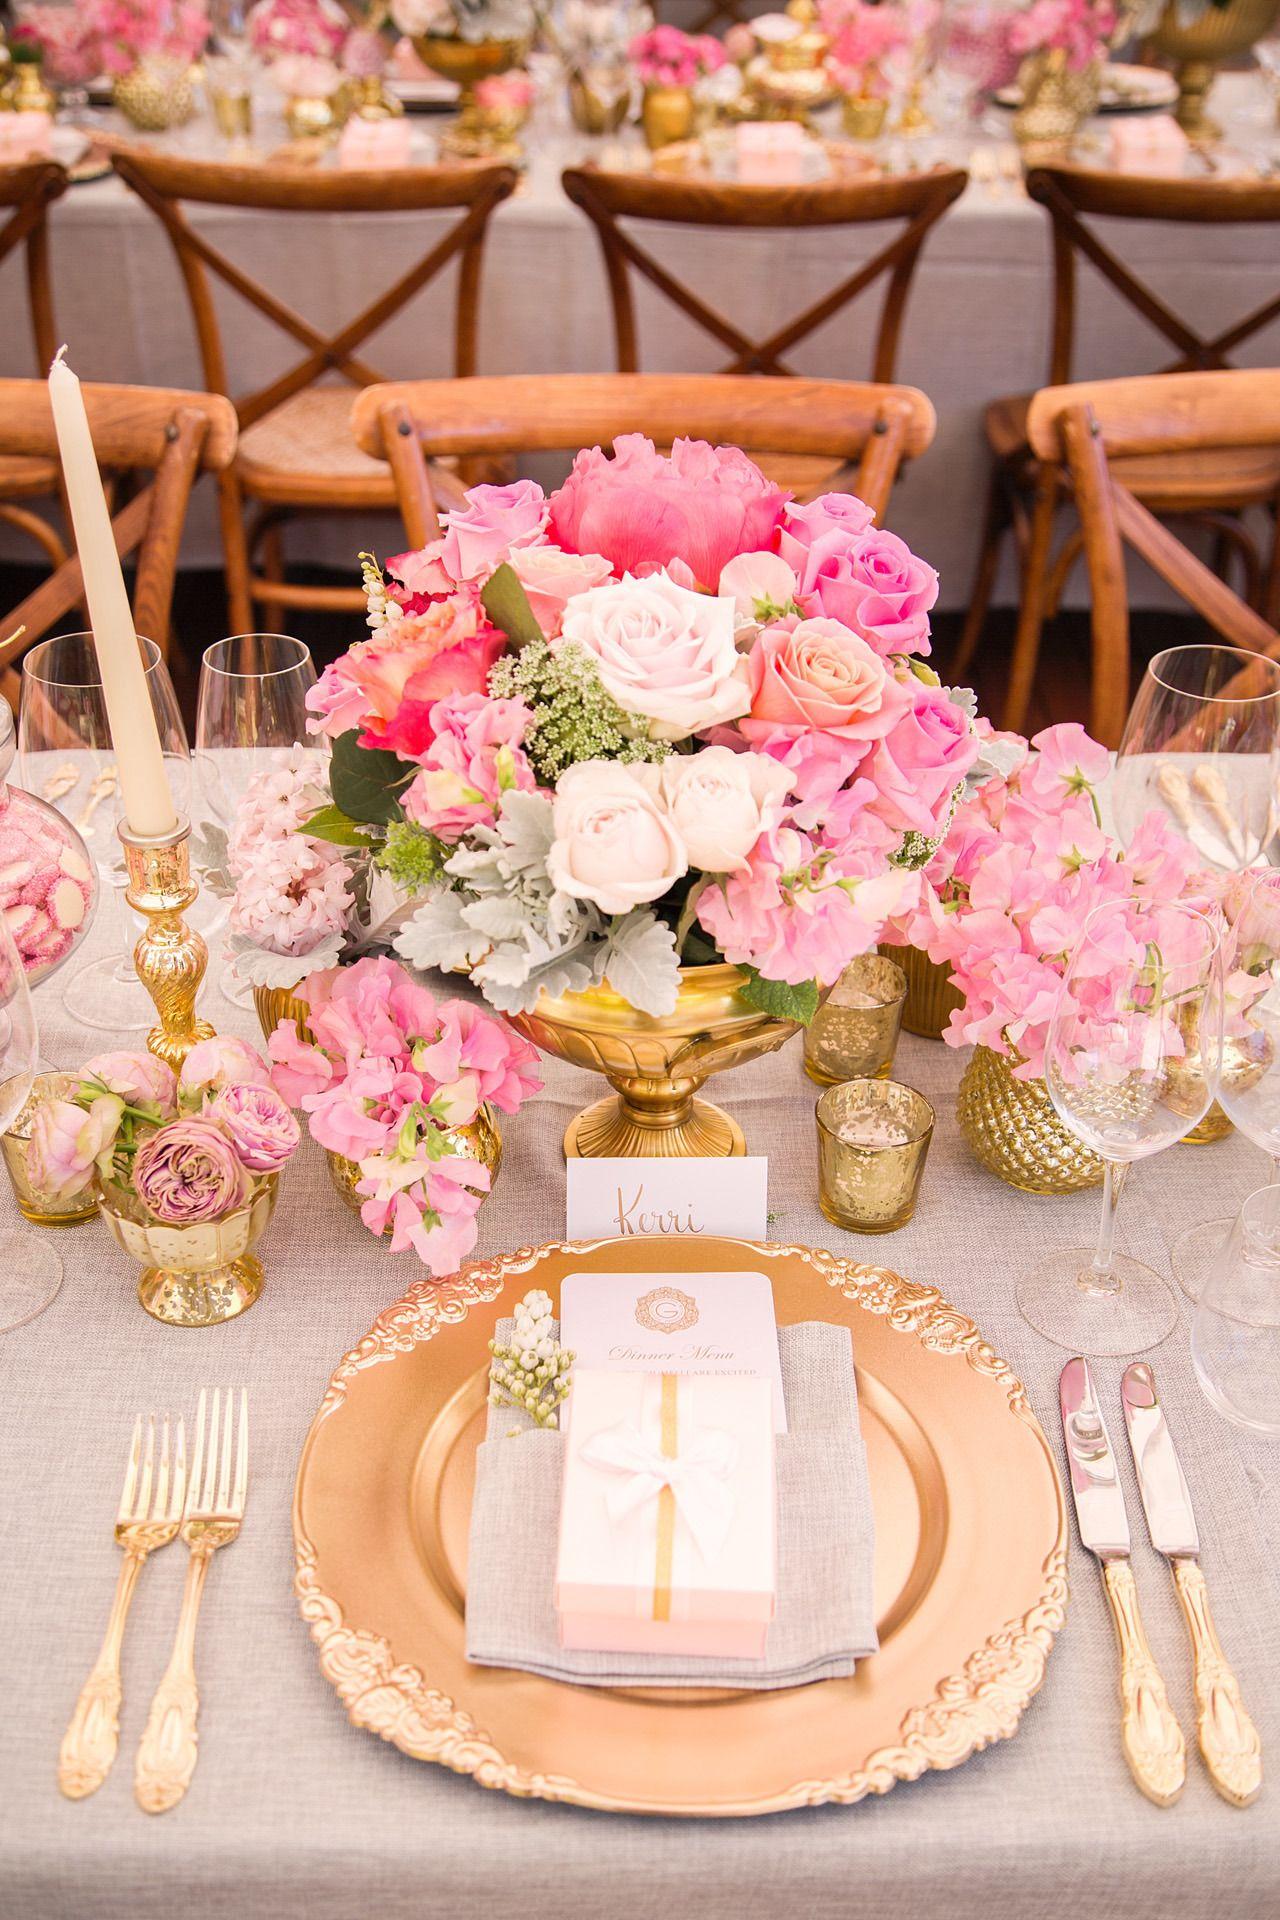 Wedding decorations on tables  Glamorous Pink u Ivory Country Wedding  Photography studios Studio